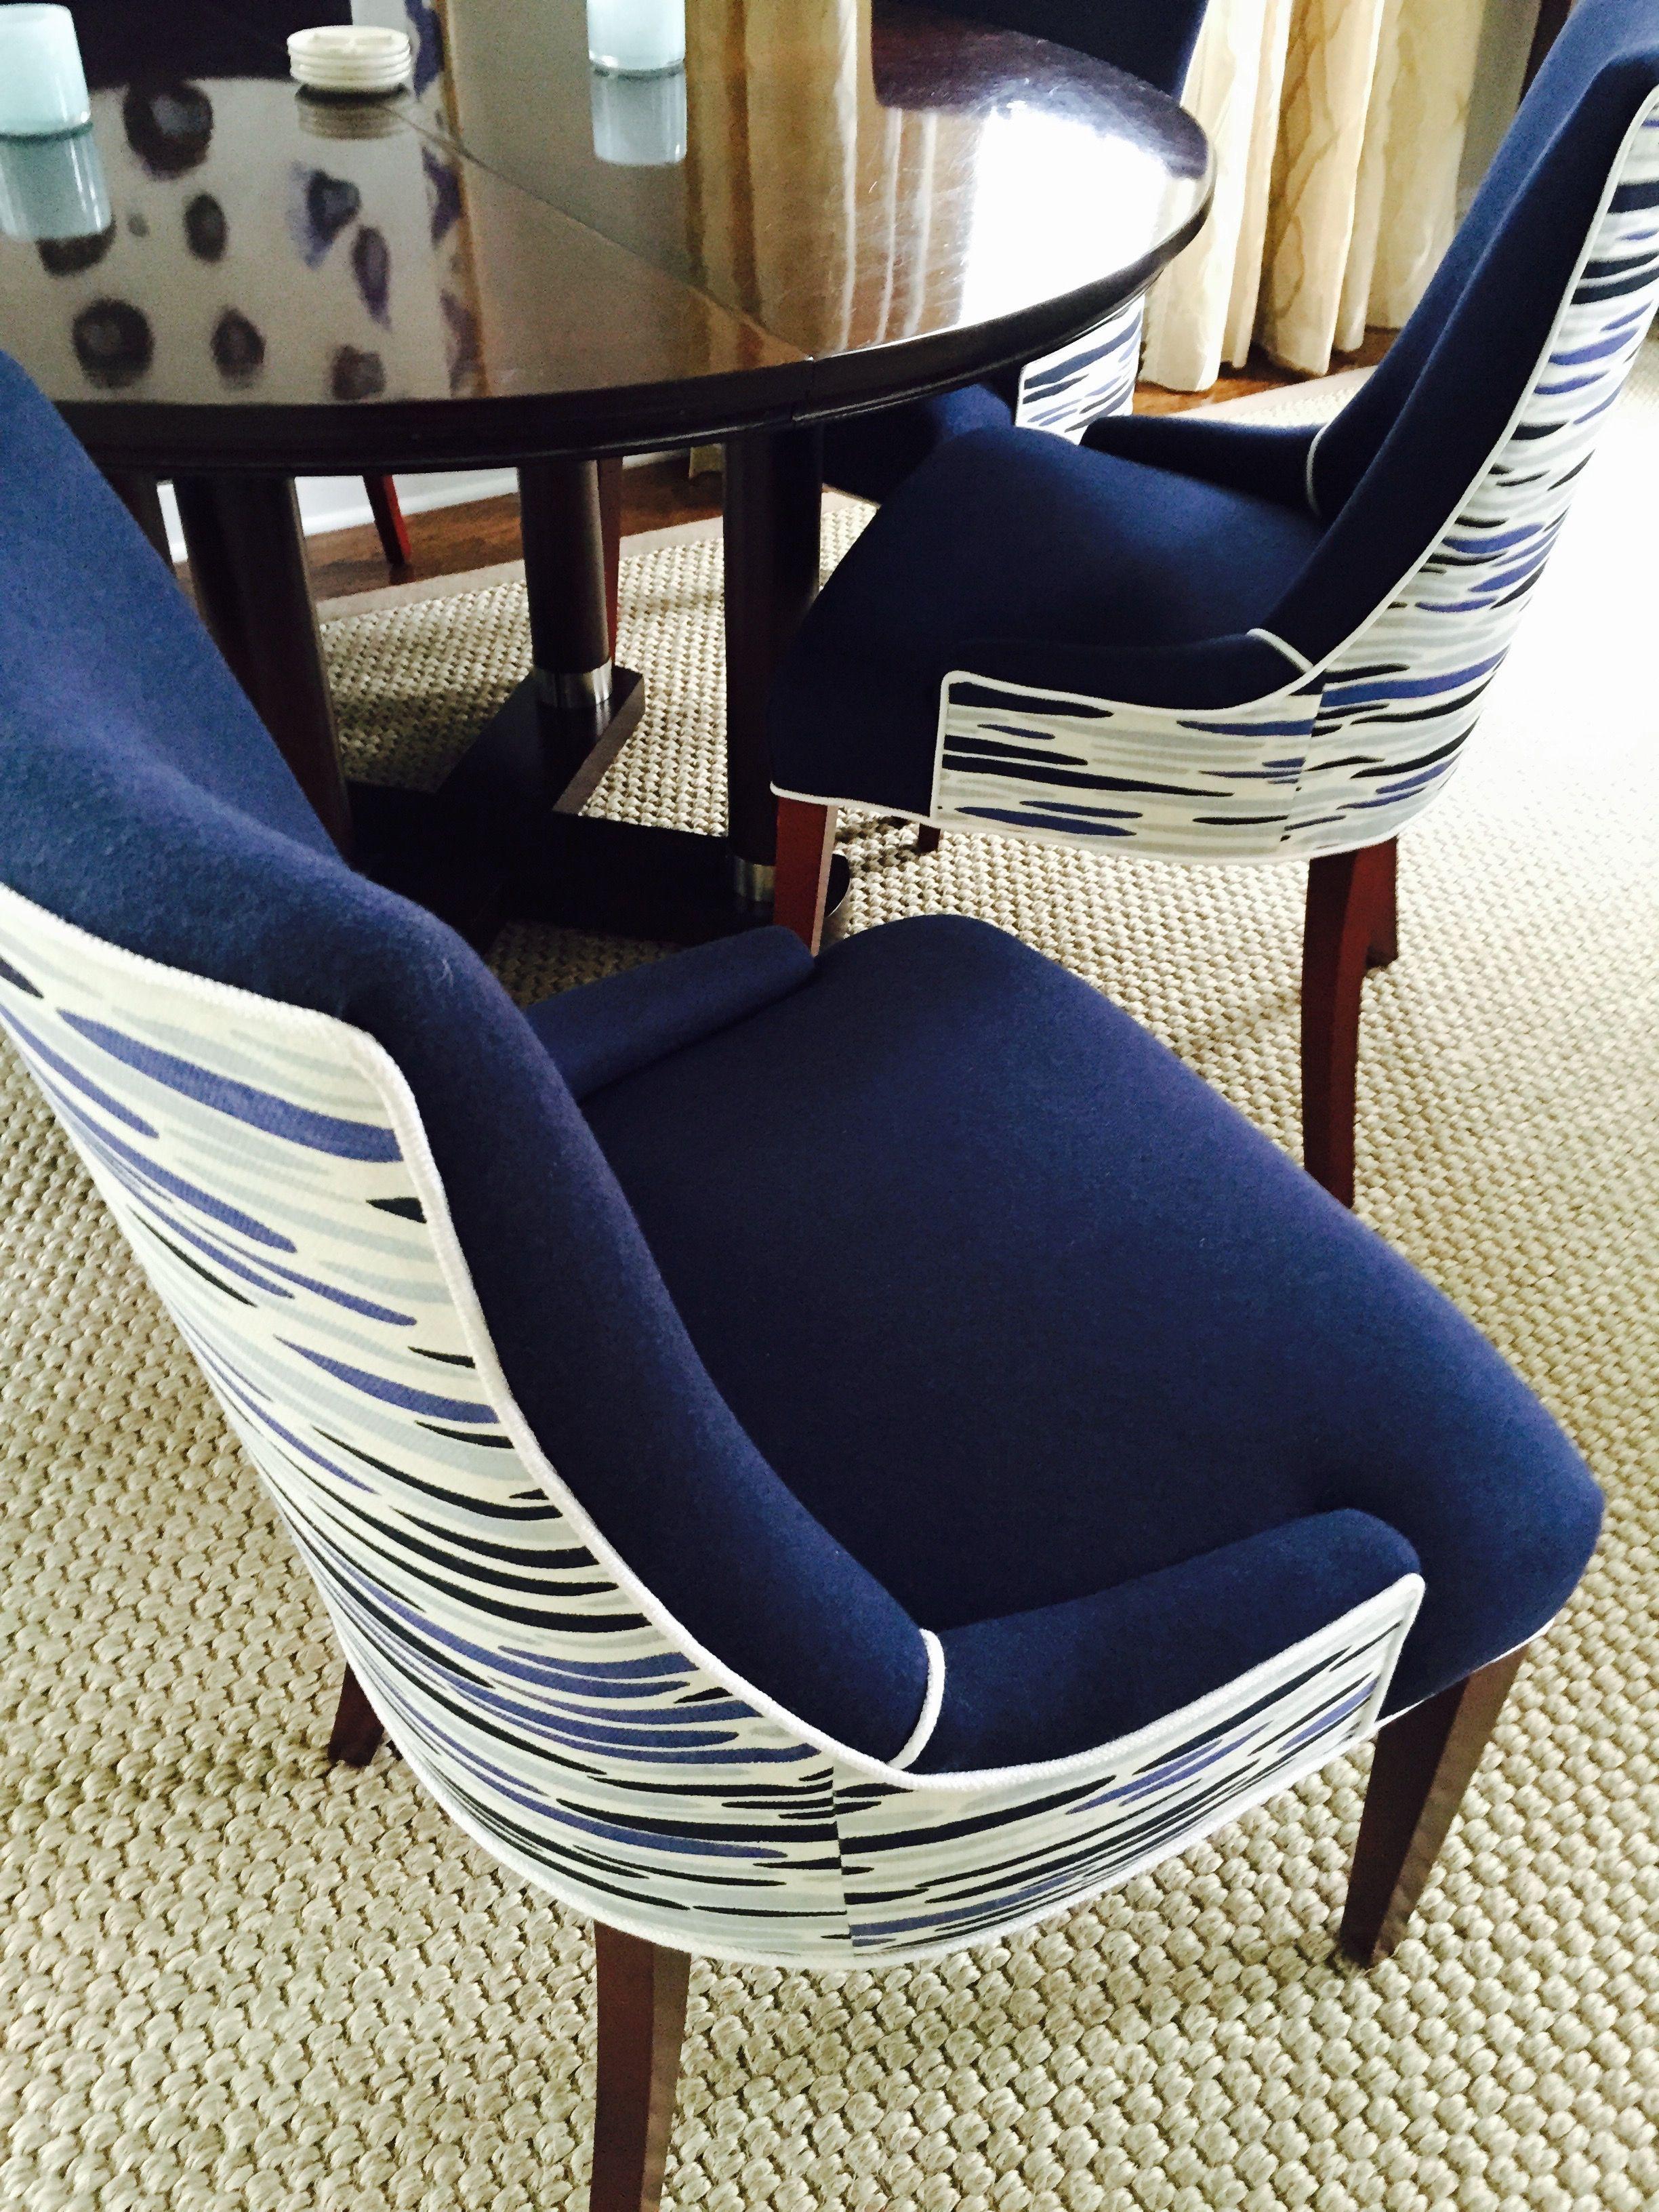 Leopold Group Designed Custom Upholstered Dining Chairs In Lulu Dk Fabric Robert Allen Wool Blazer Navy Zimmer Rohde White Linen Contrasting Welt